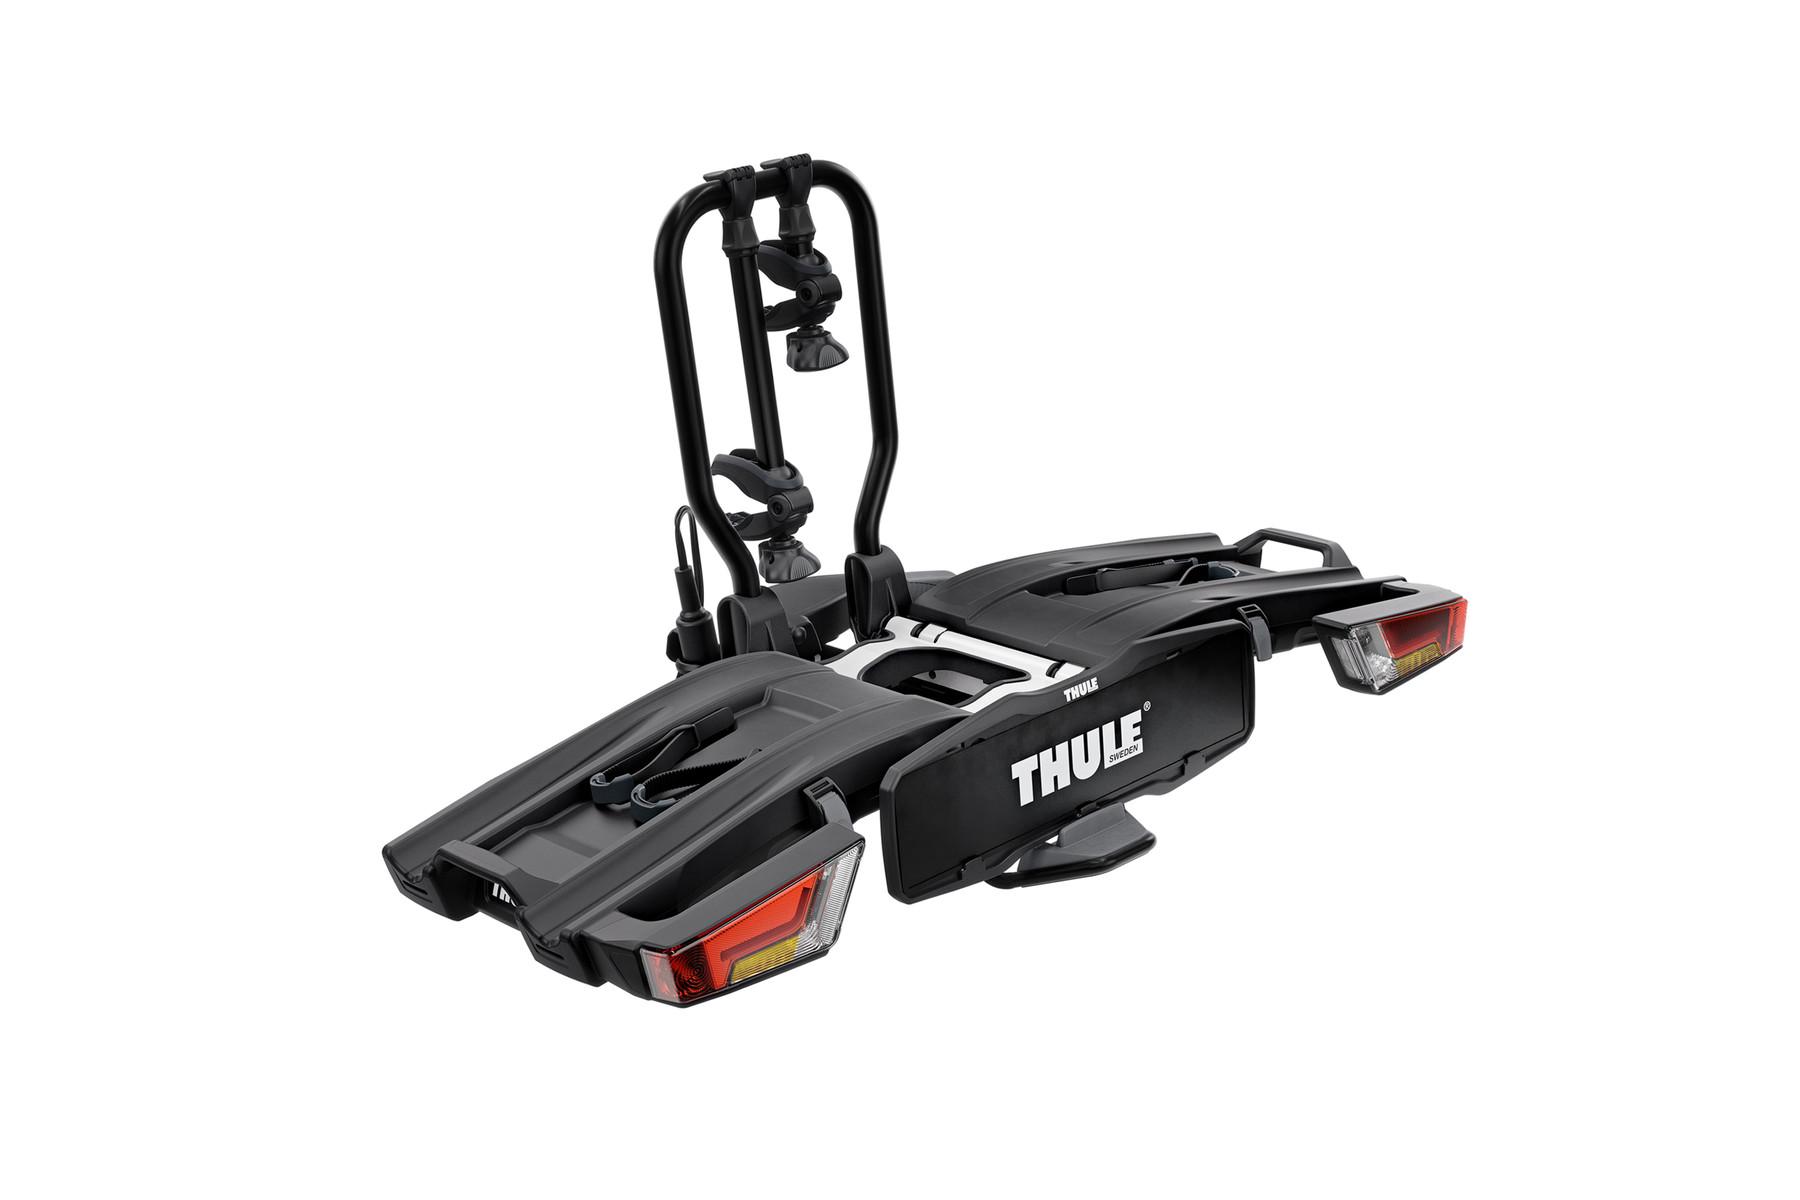 THULE 933 EasyFold XT2 Black Edition incl. Transporttasche und faltbarer Laderampe